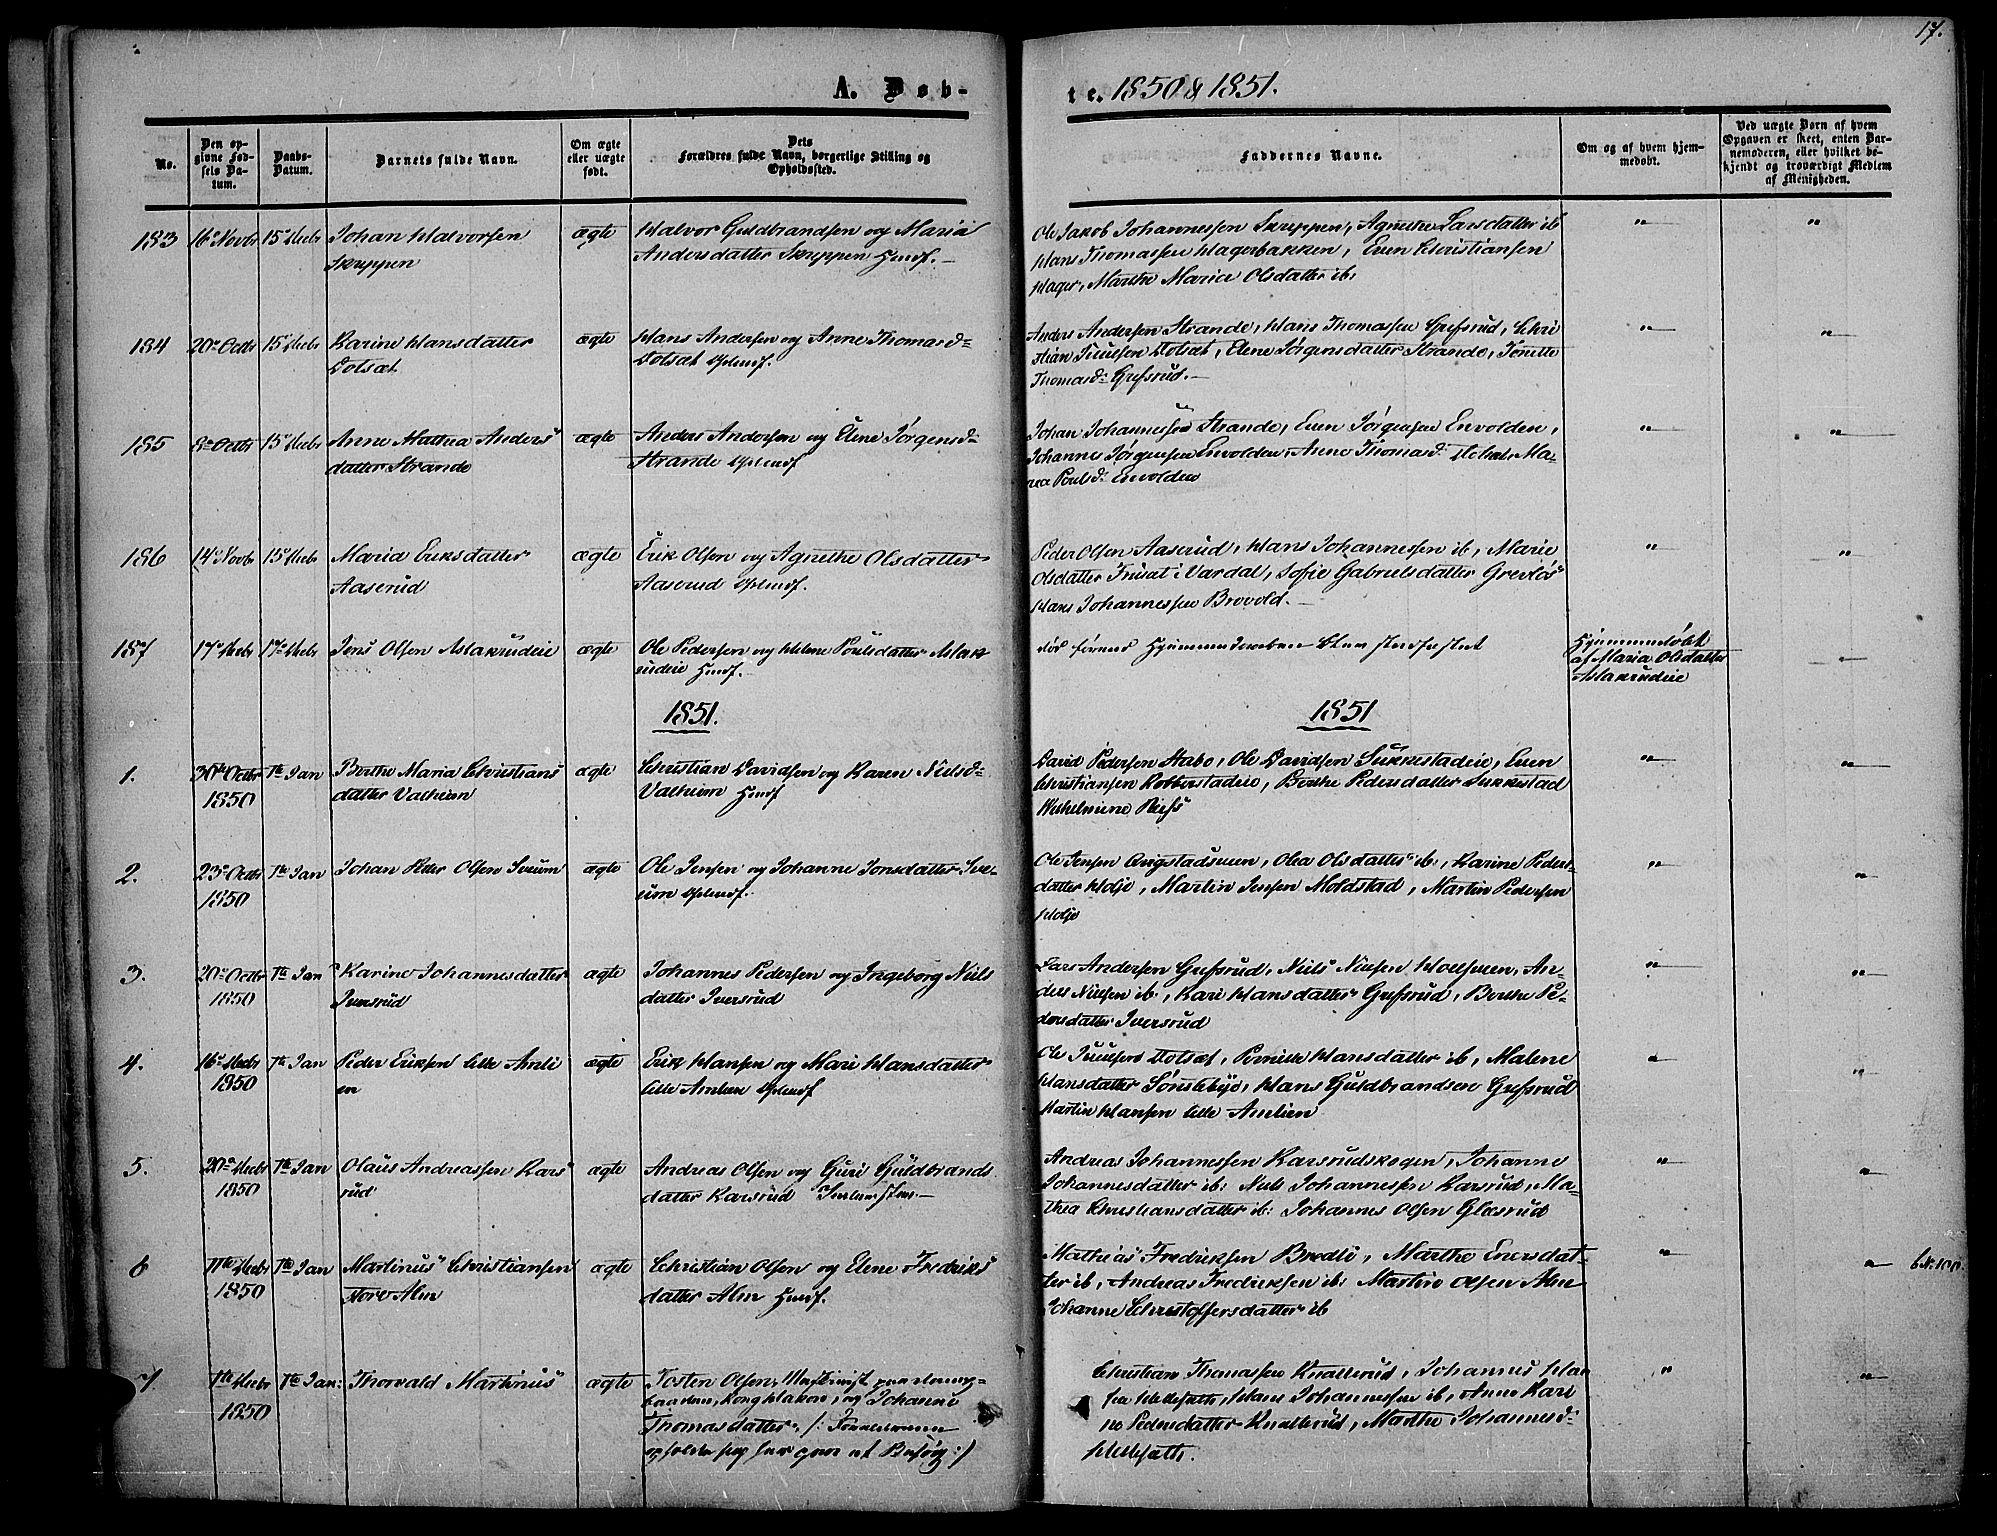 SAH, Vestre Toten prestekontor, H/Ha/Haa/L0005: Ministerialbok nr. 5, 1850-1855, s. 17